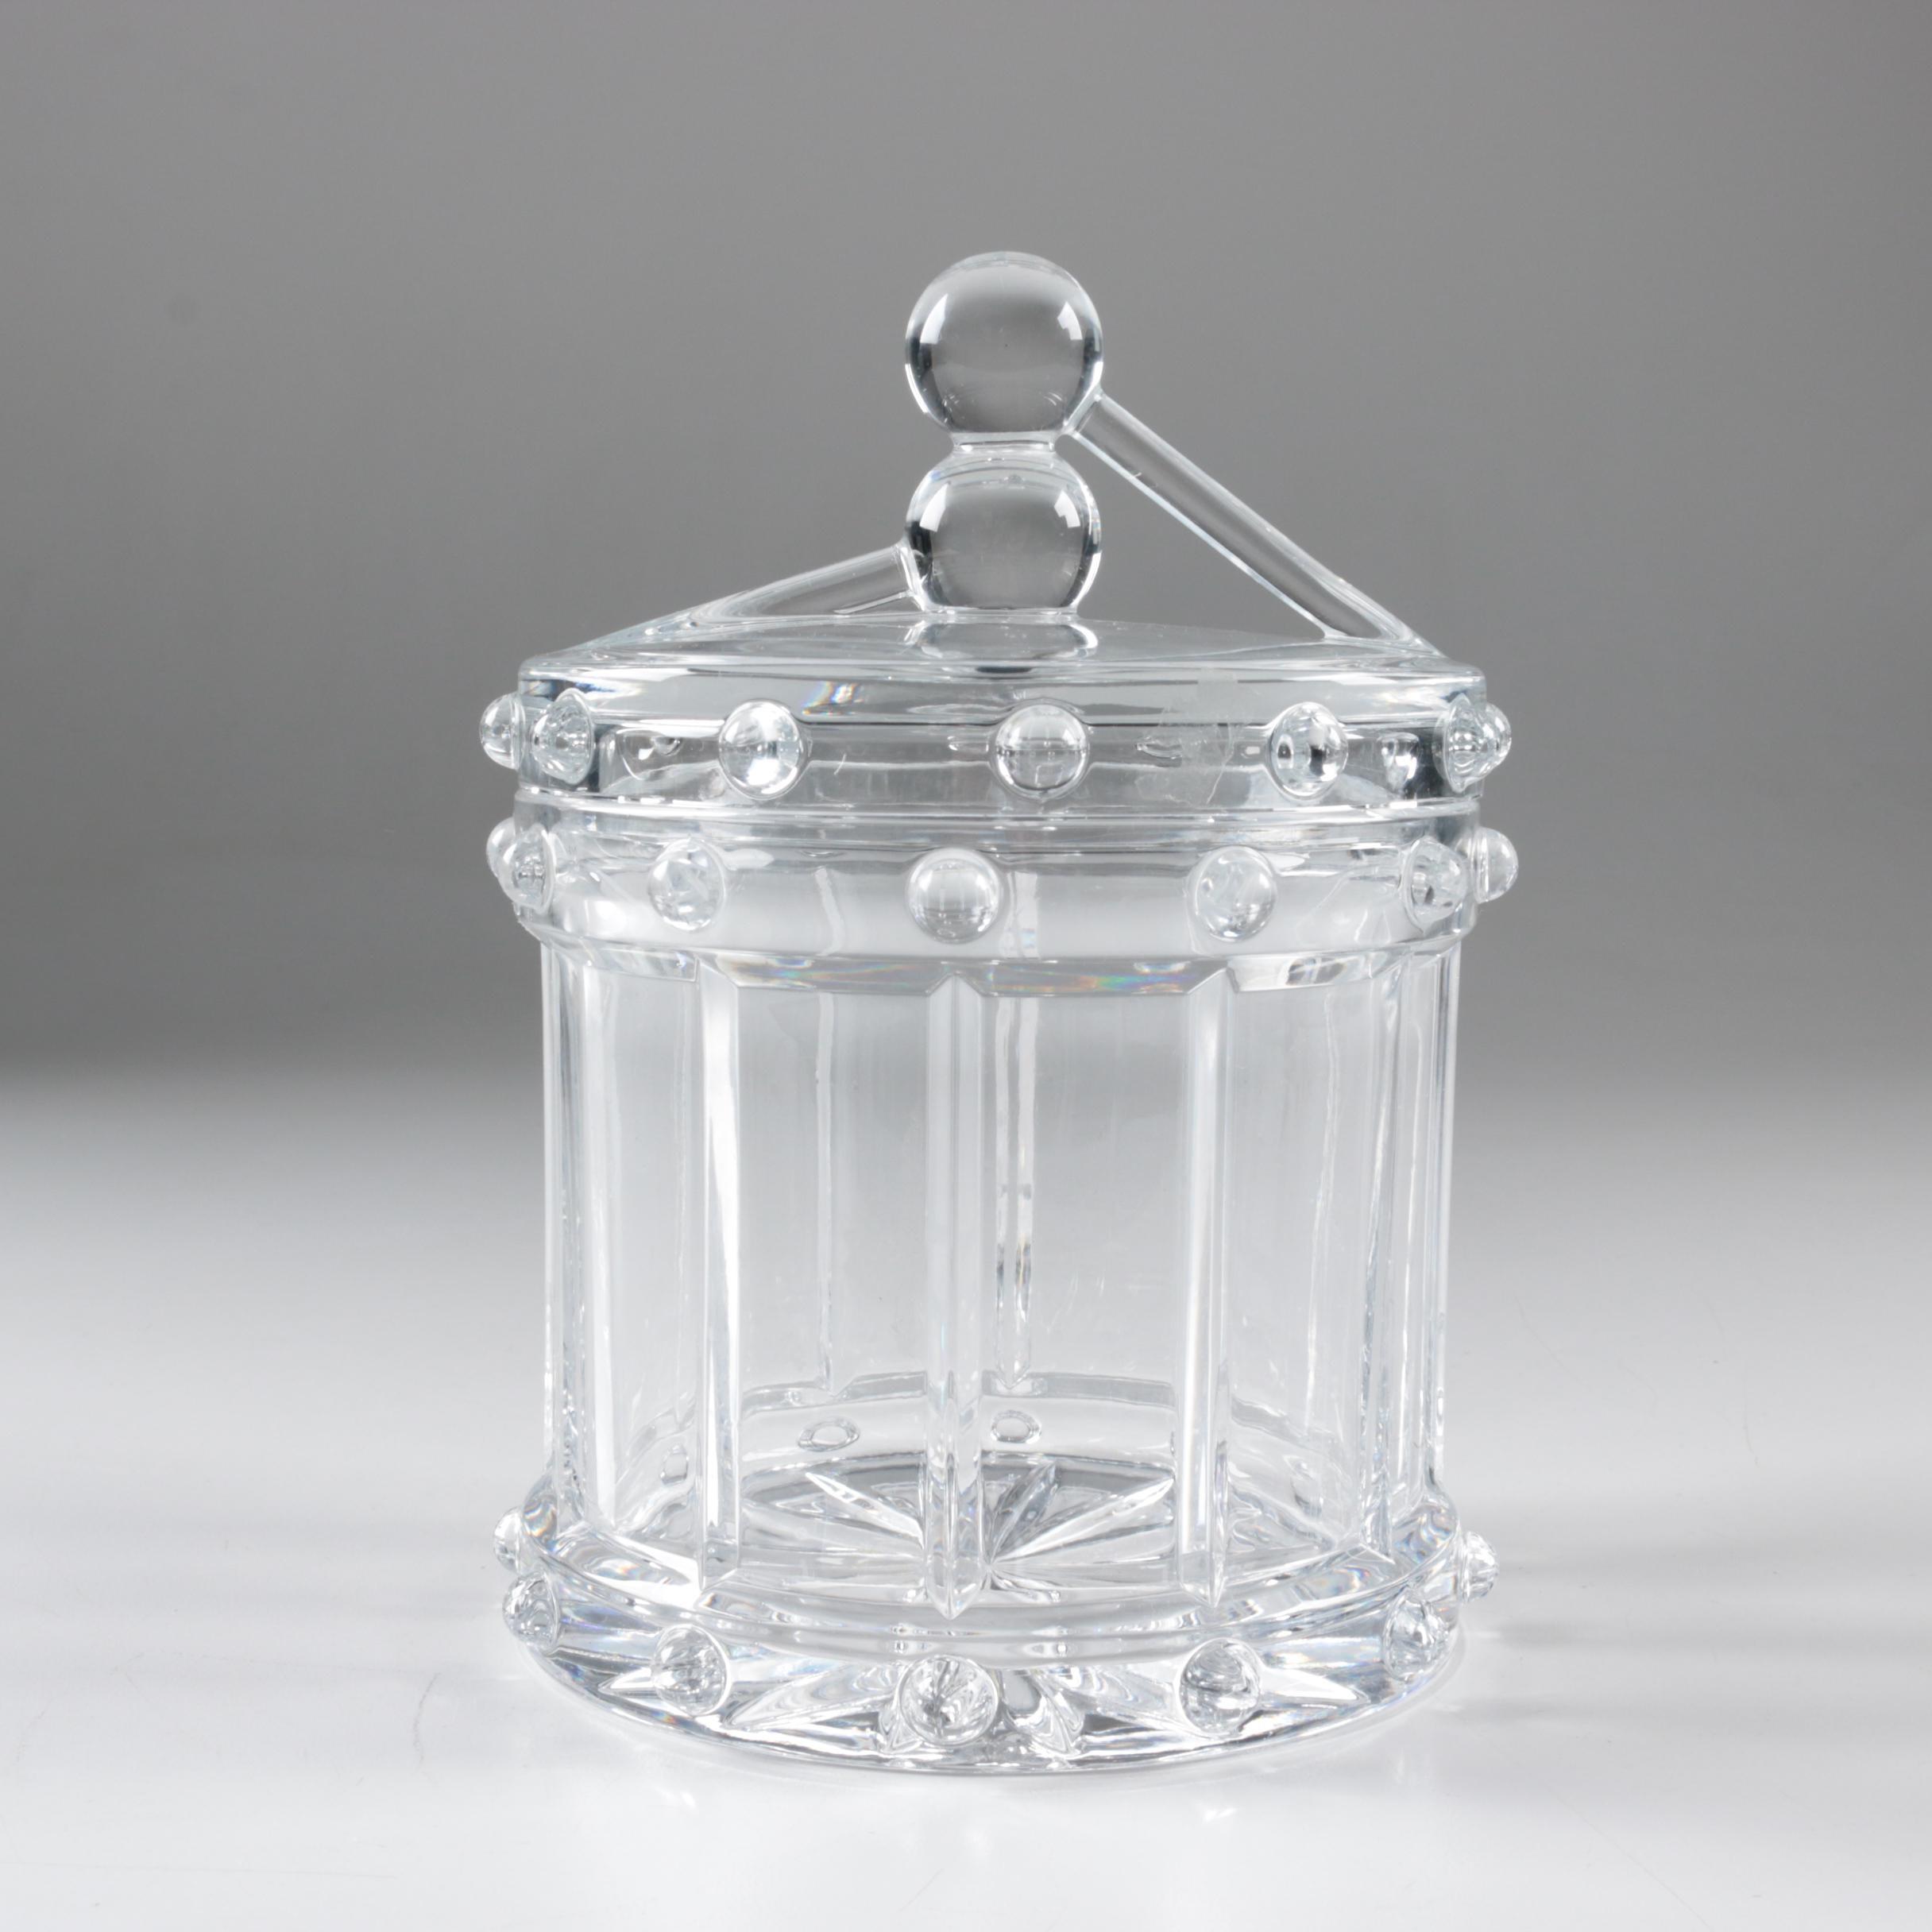 Glass Drum Shaped Biscuit Jar